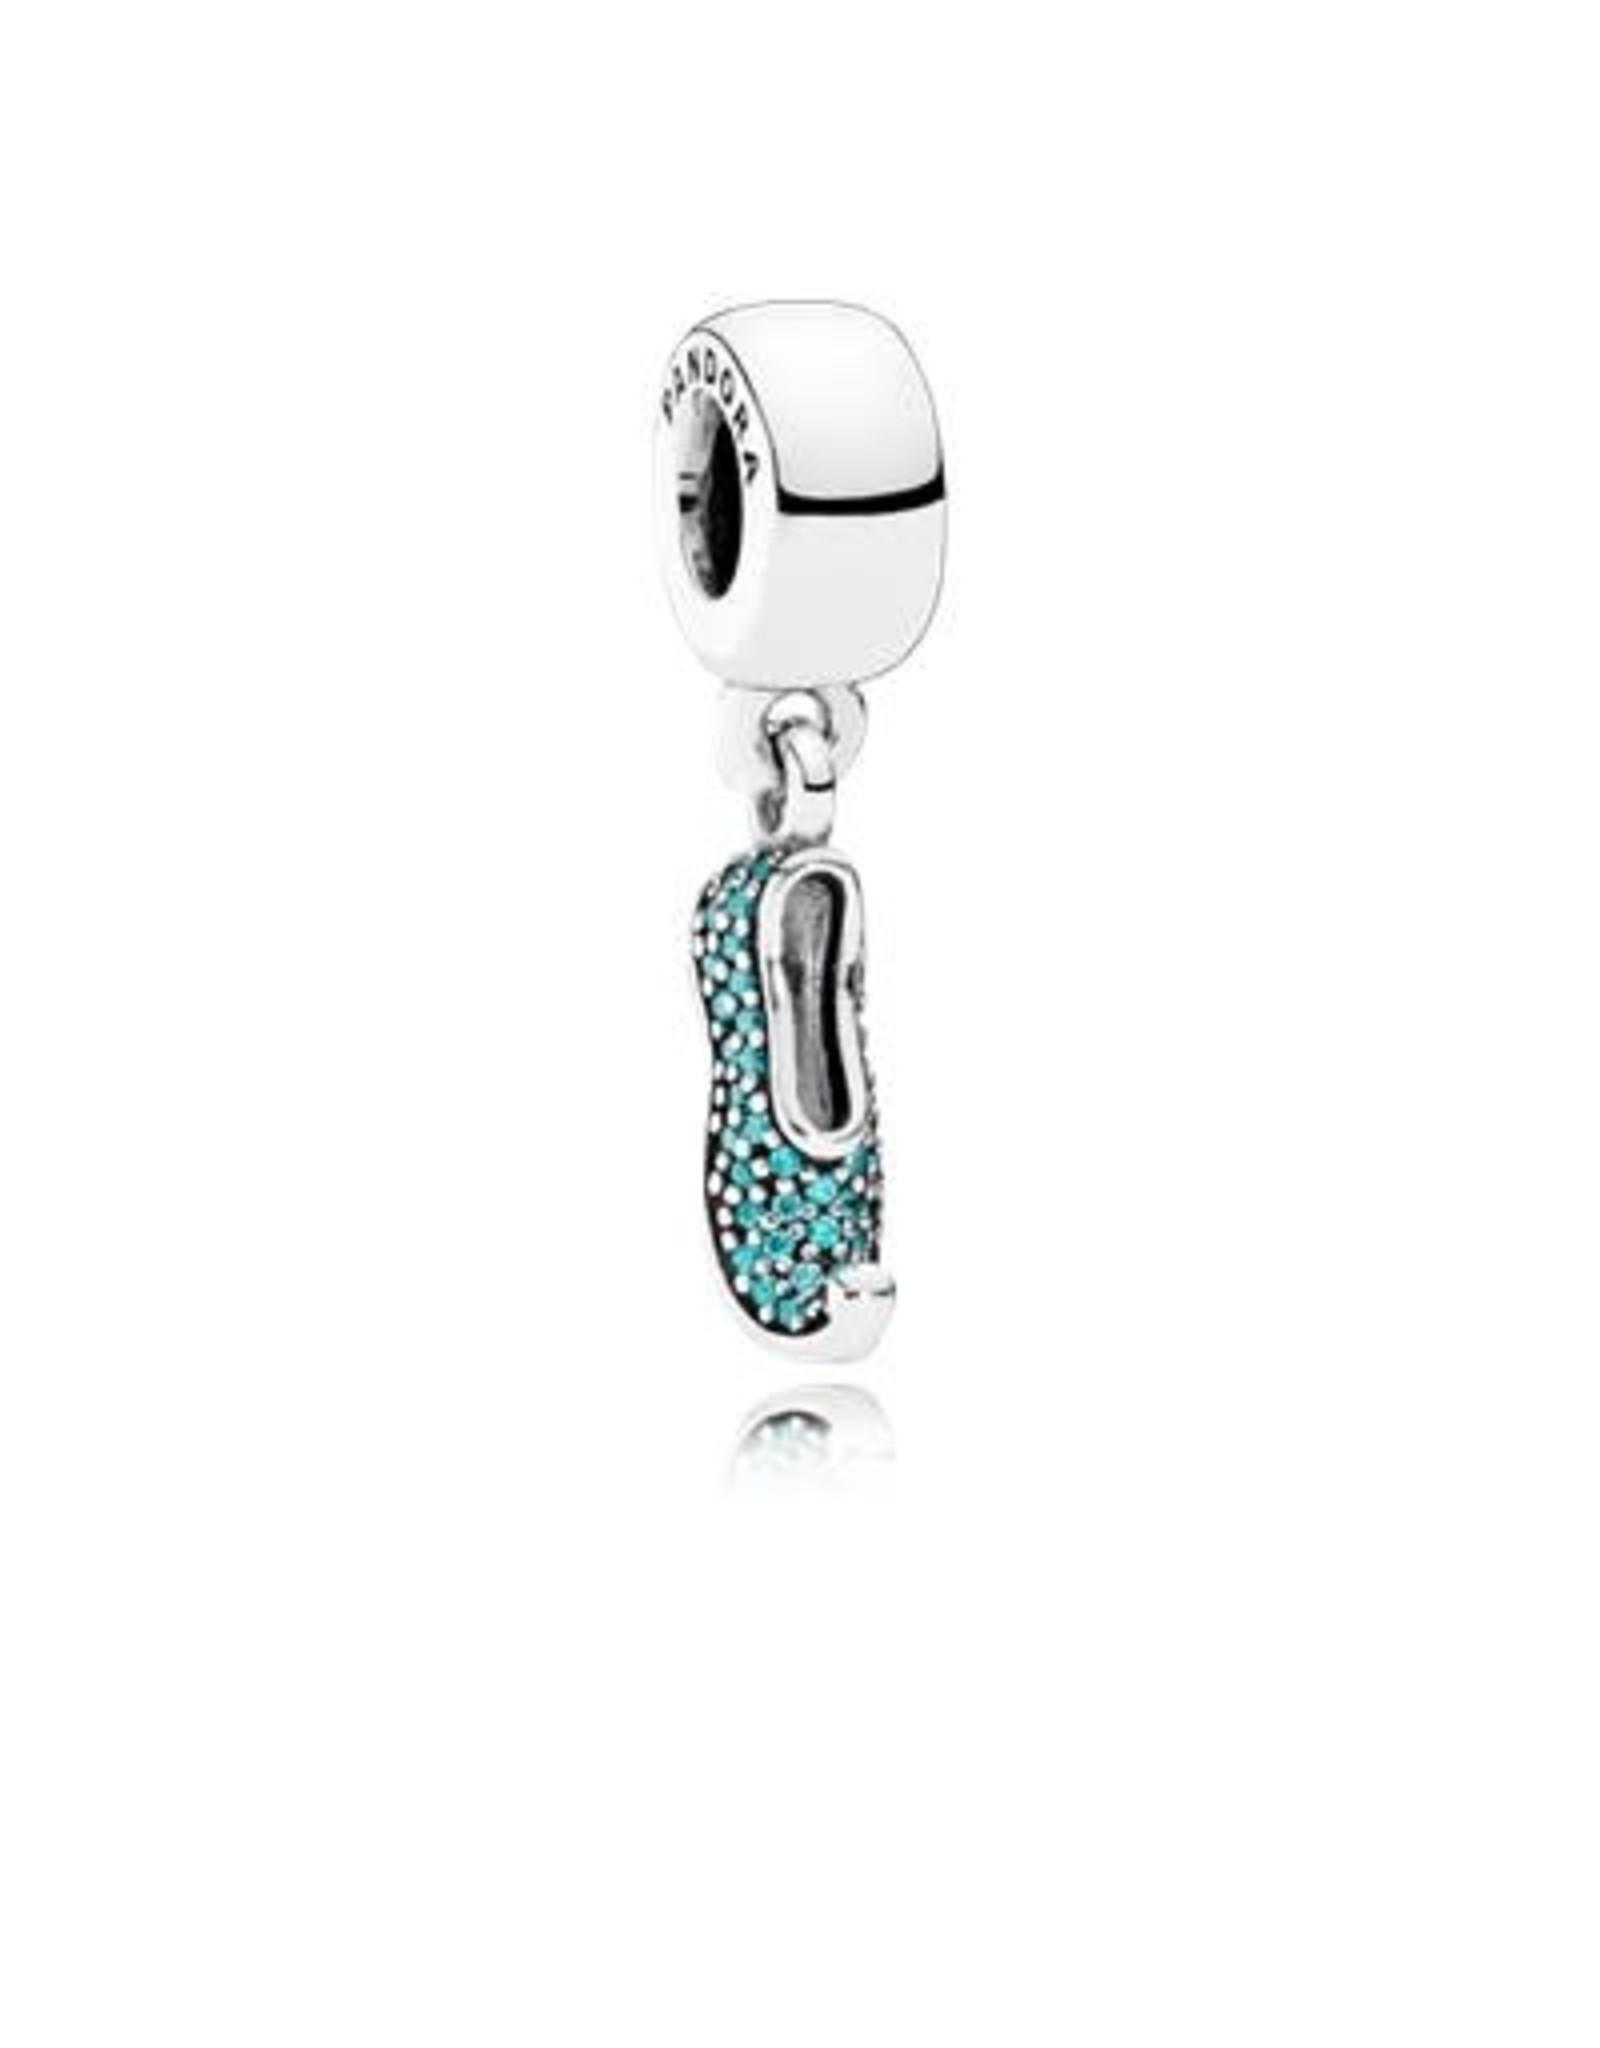 Pandora Pandora Charm, Disney, Jasmine's Sparkling Slipper